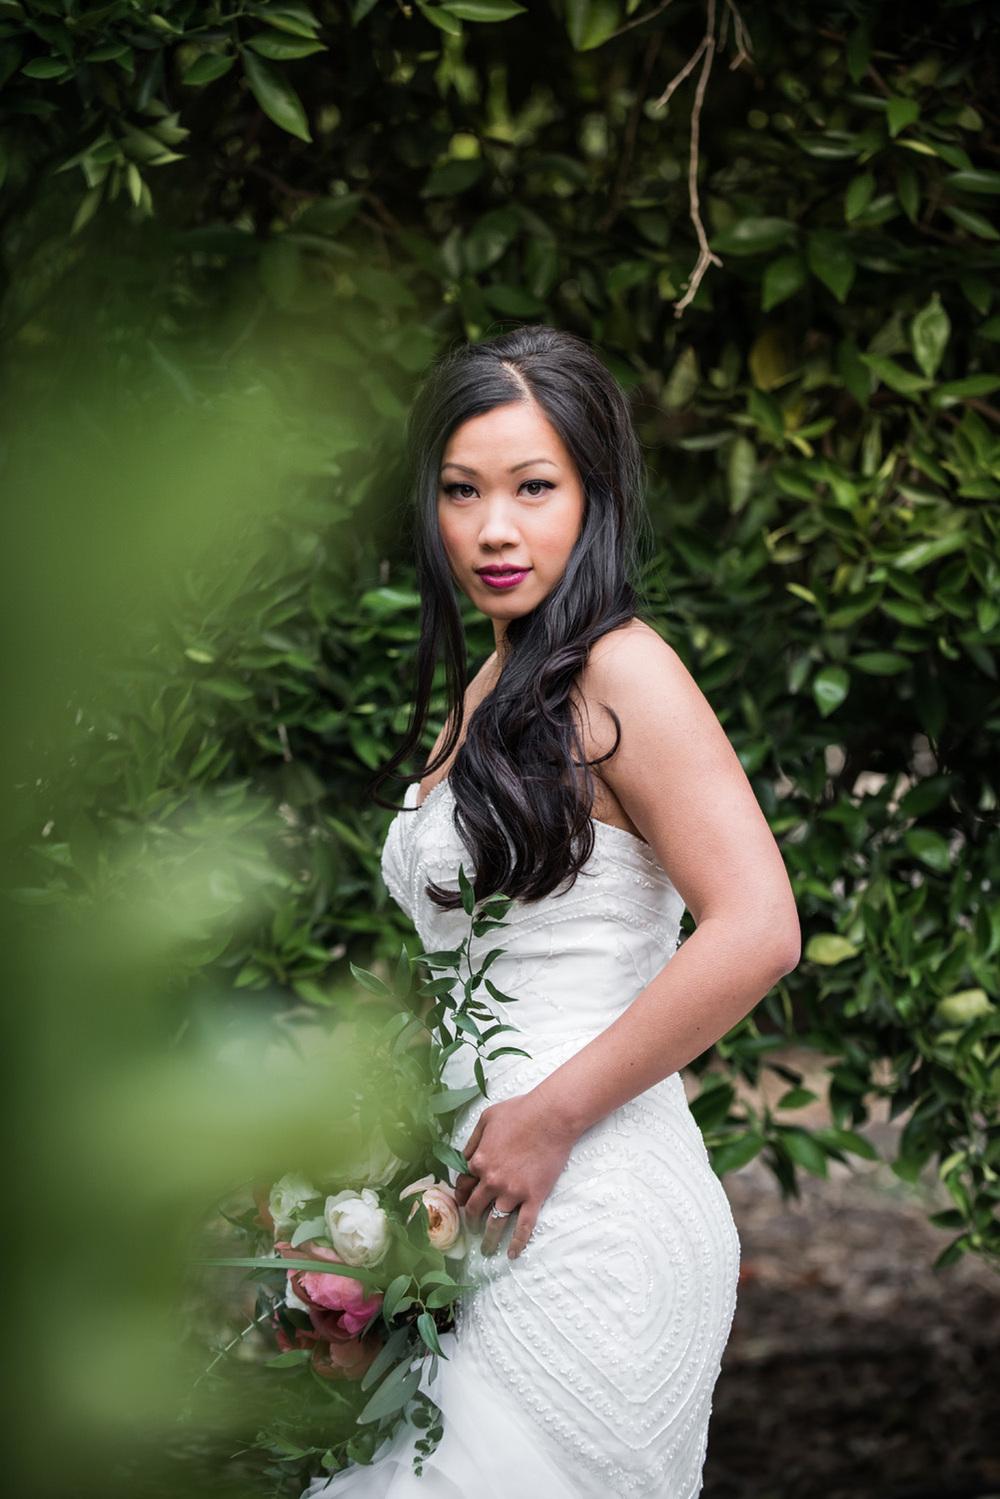 bride_styledshoot_orangegroves_prospectpark_weddingdress